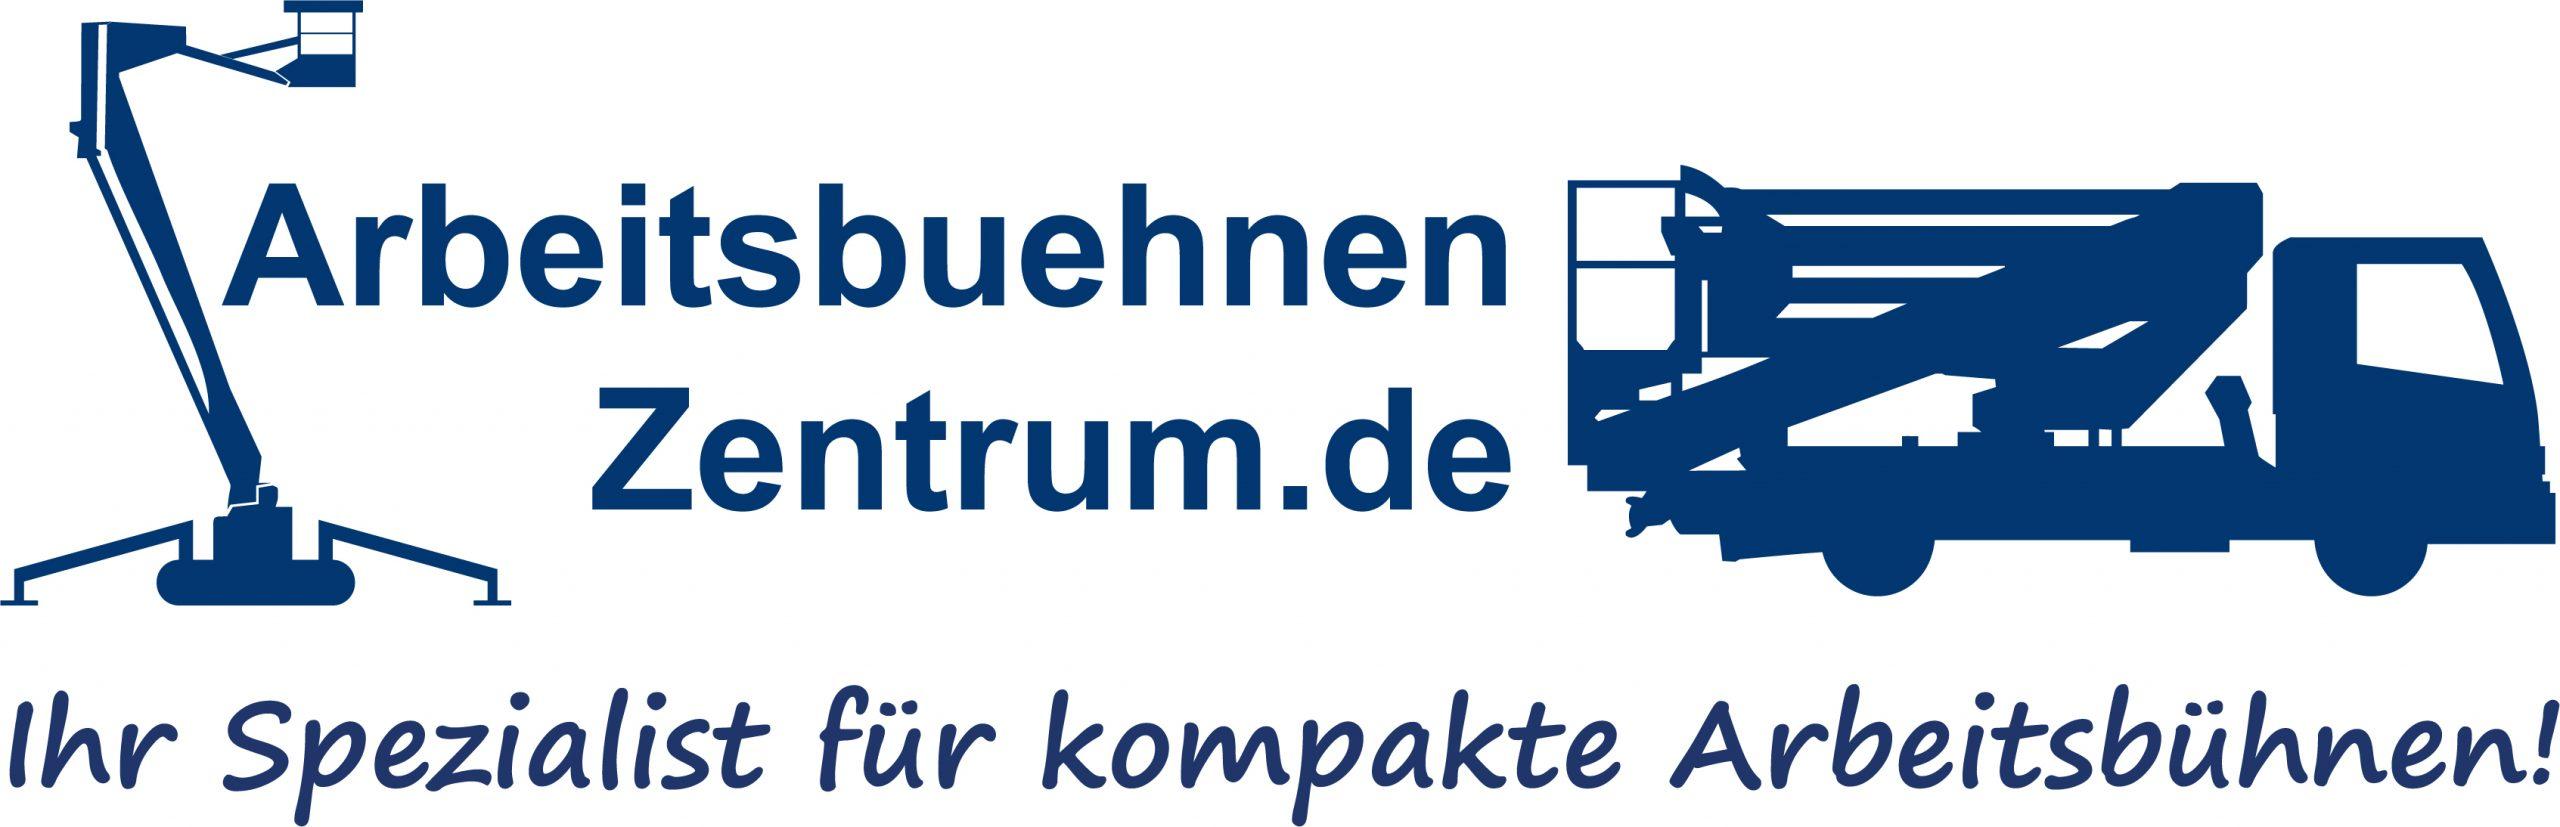 Arbeitsbuehnenzentrum.de